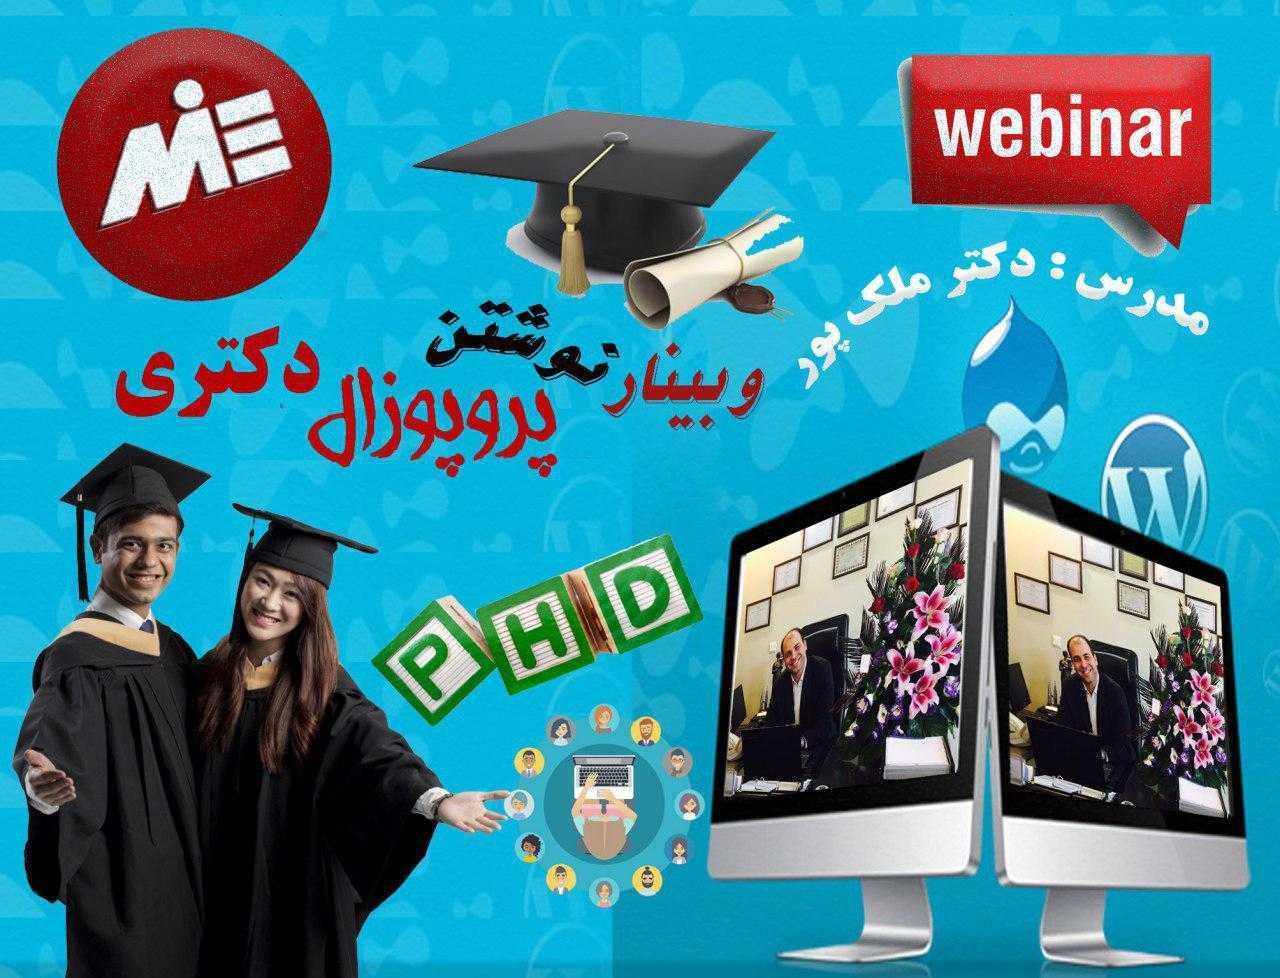 webinar phd proposal وبینار آموزش apply برای دکتری